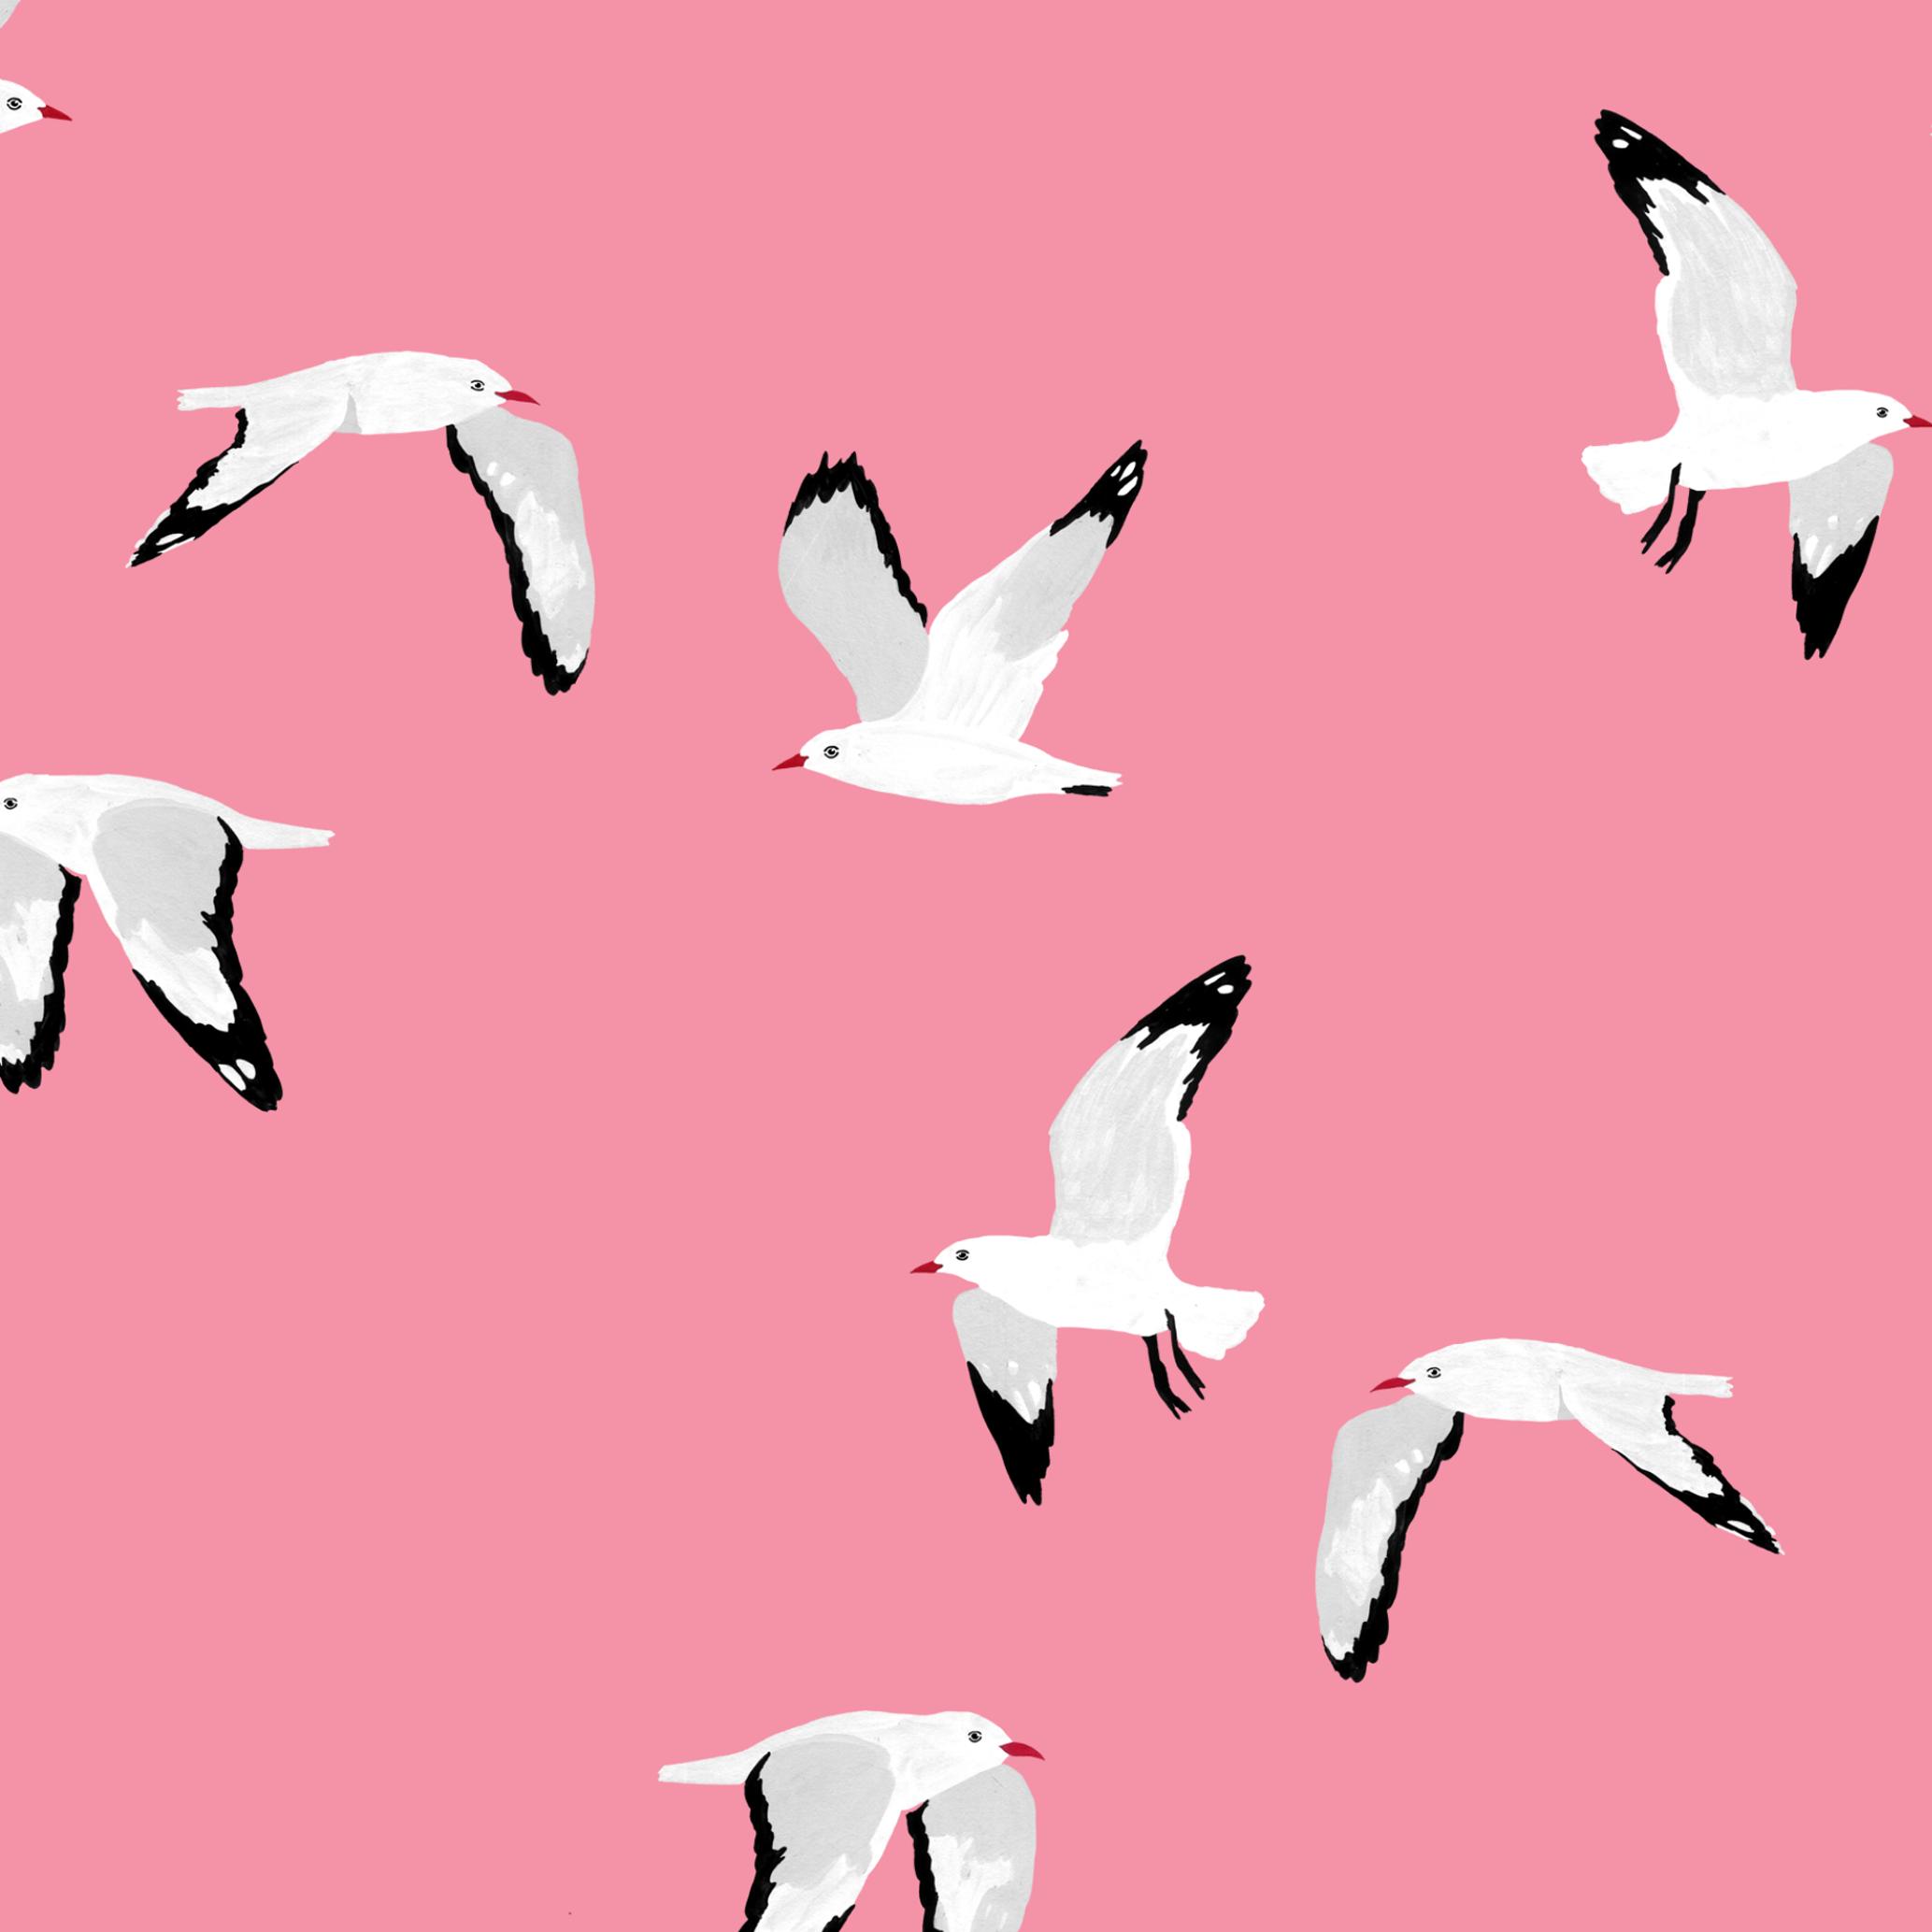 melissa boardman seagulls scatter pattern pink.png